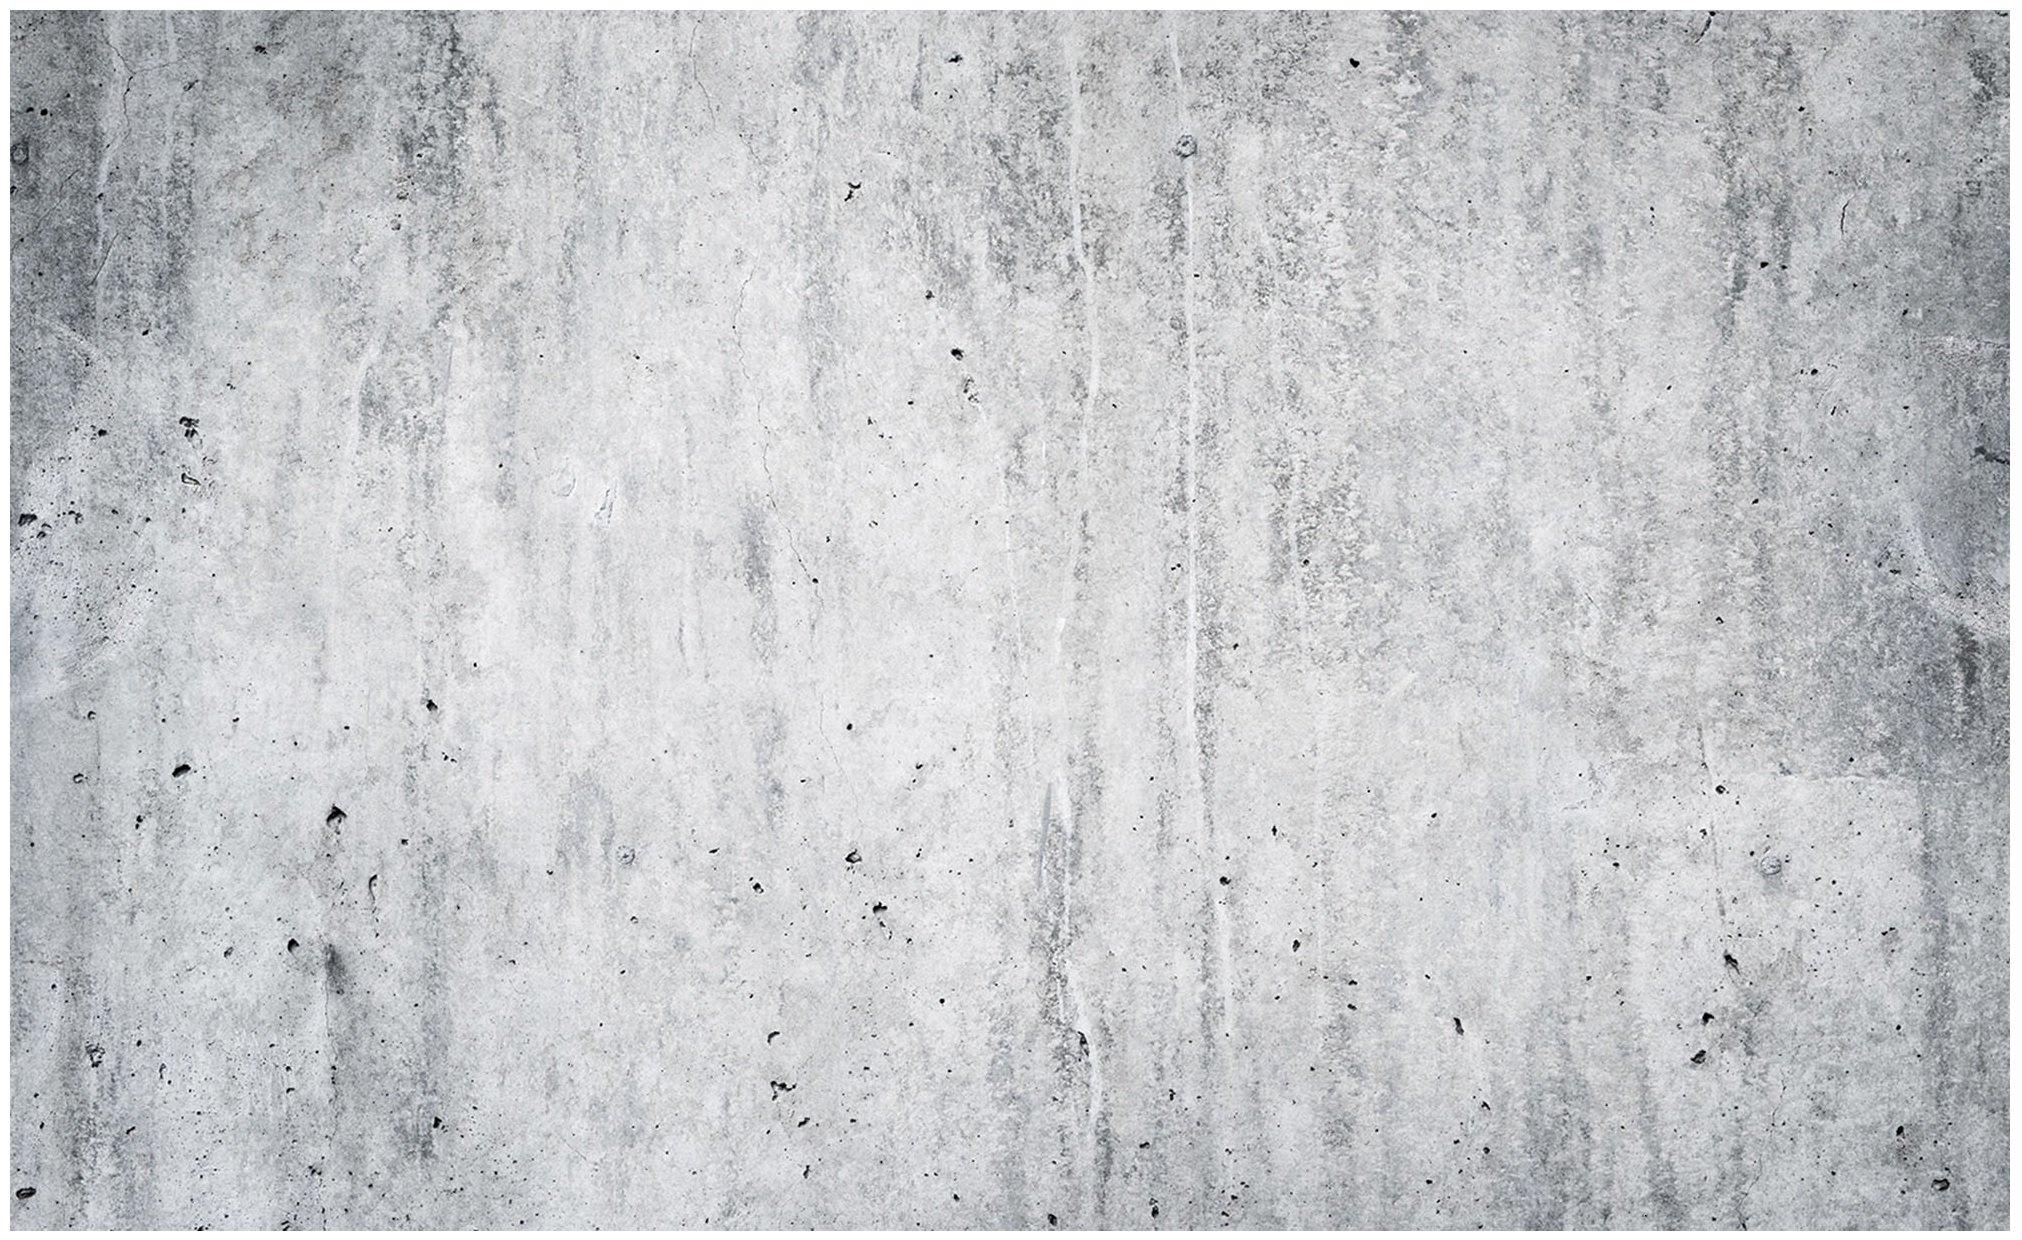 Fototapeta beton 3D stara ściana mur